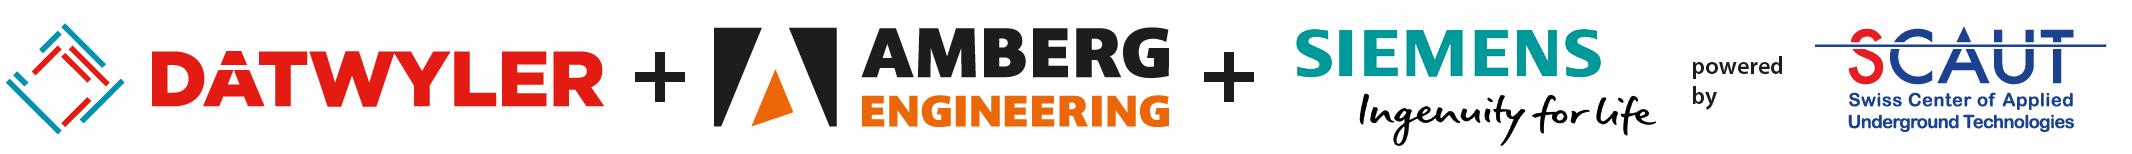 Datwyler Siemens Amberg Scout